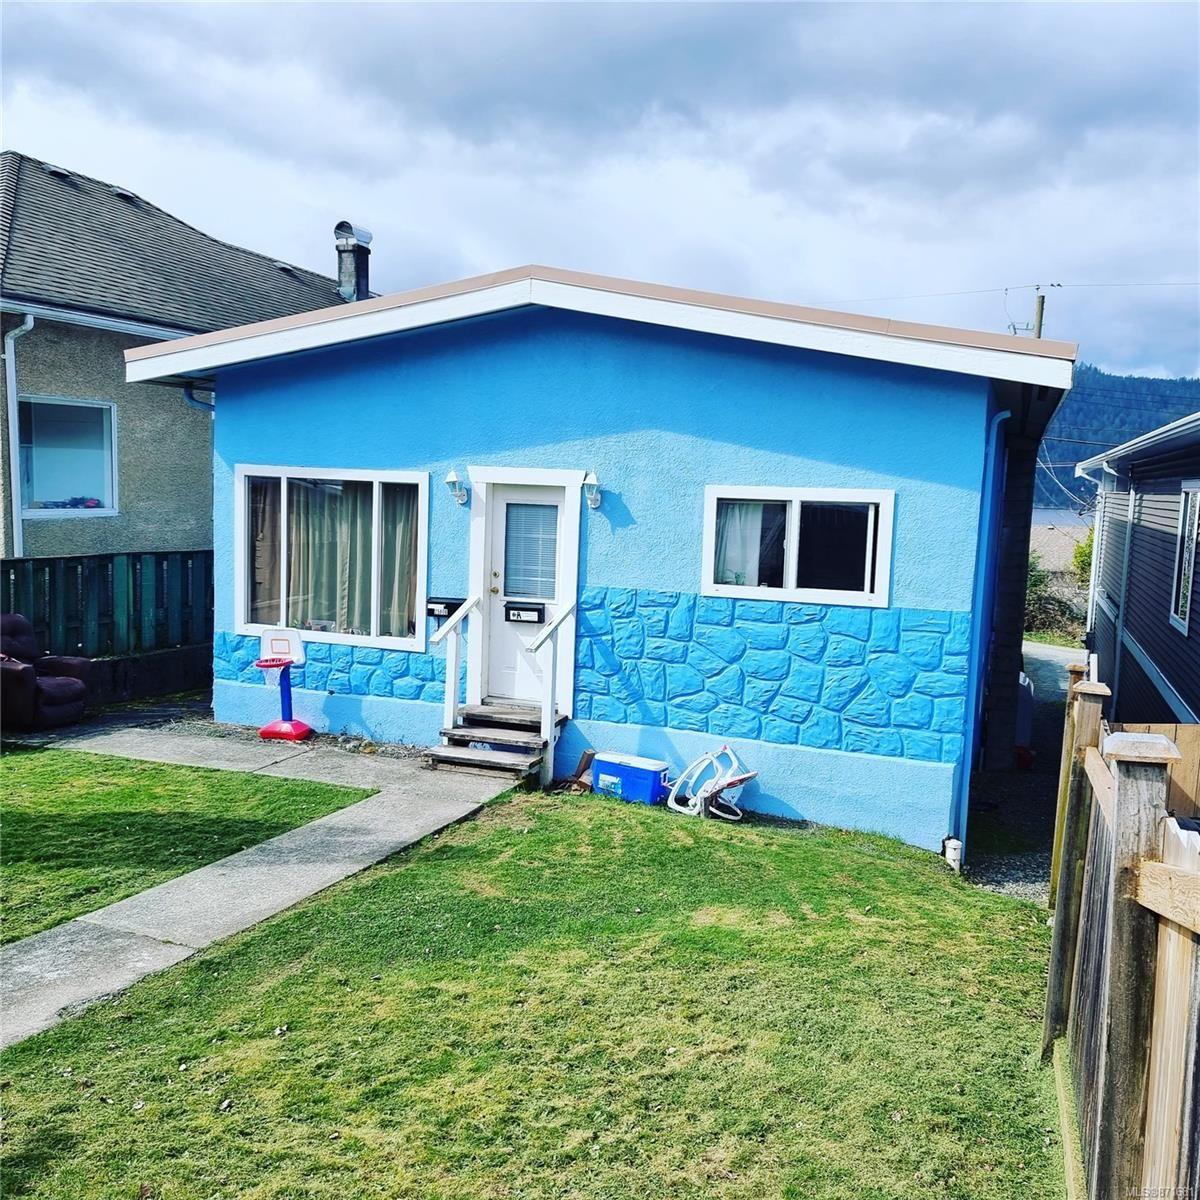 Main Photo: 2580 2nd Ave in : PA Port Alberni House for sale (Port Alberni)  : MLS®# 871681